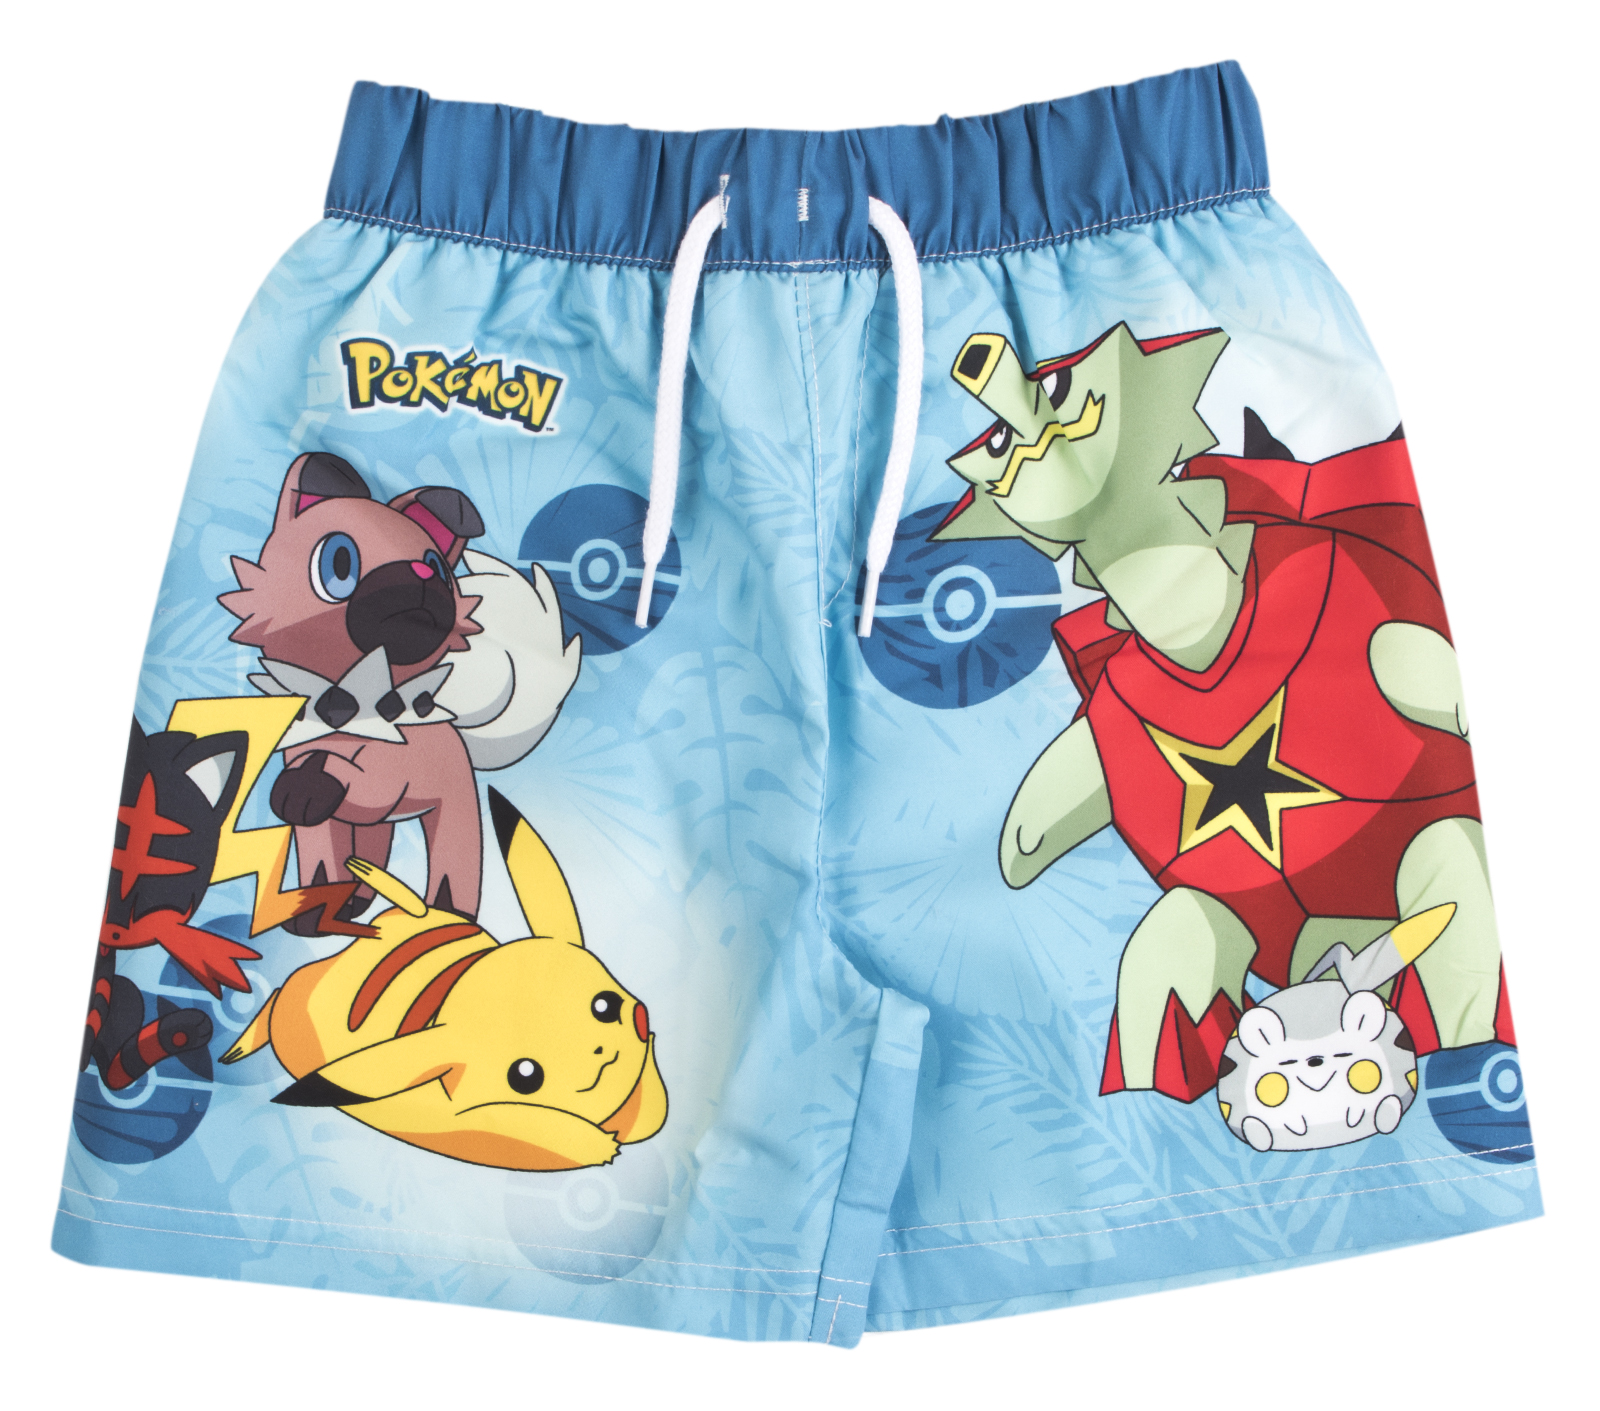 f0c1982b85ac0 Pokemon Swim Shorts Pikachu Summer Board Swimming Trunks